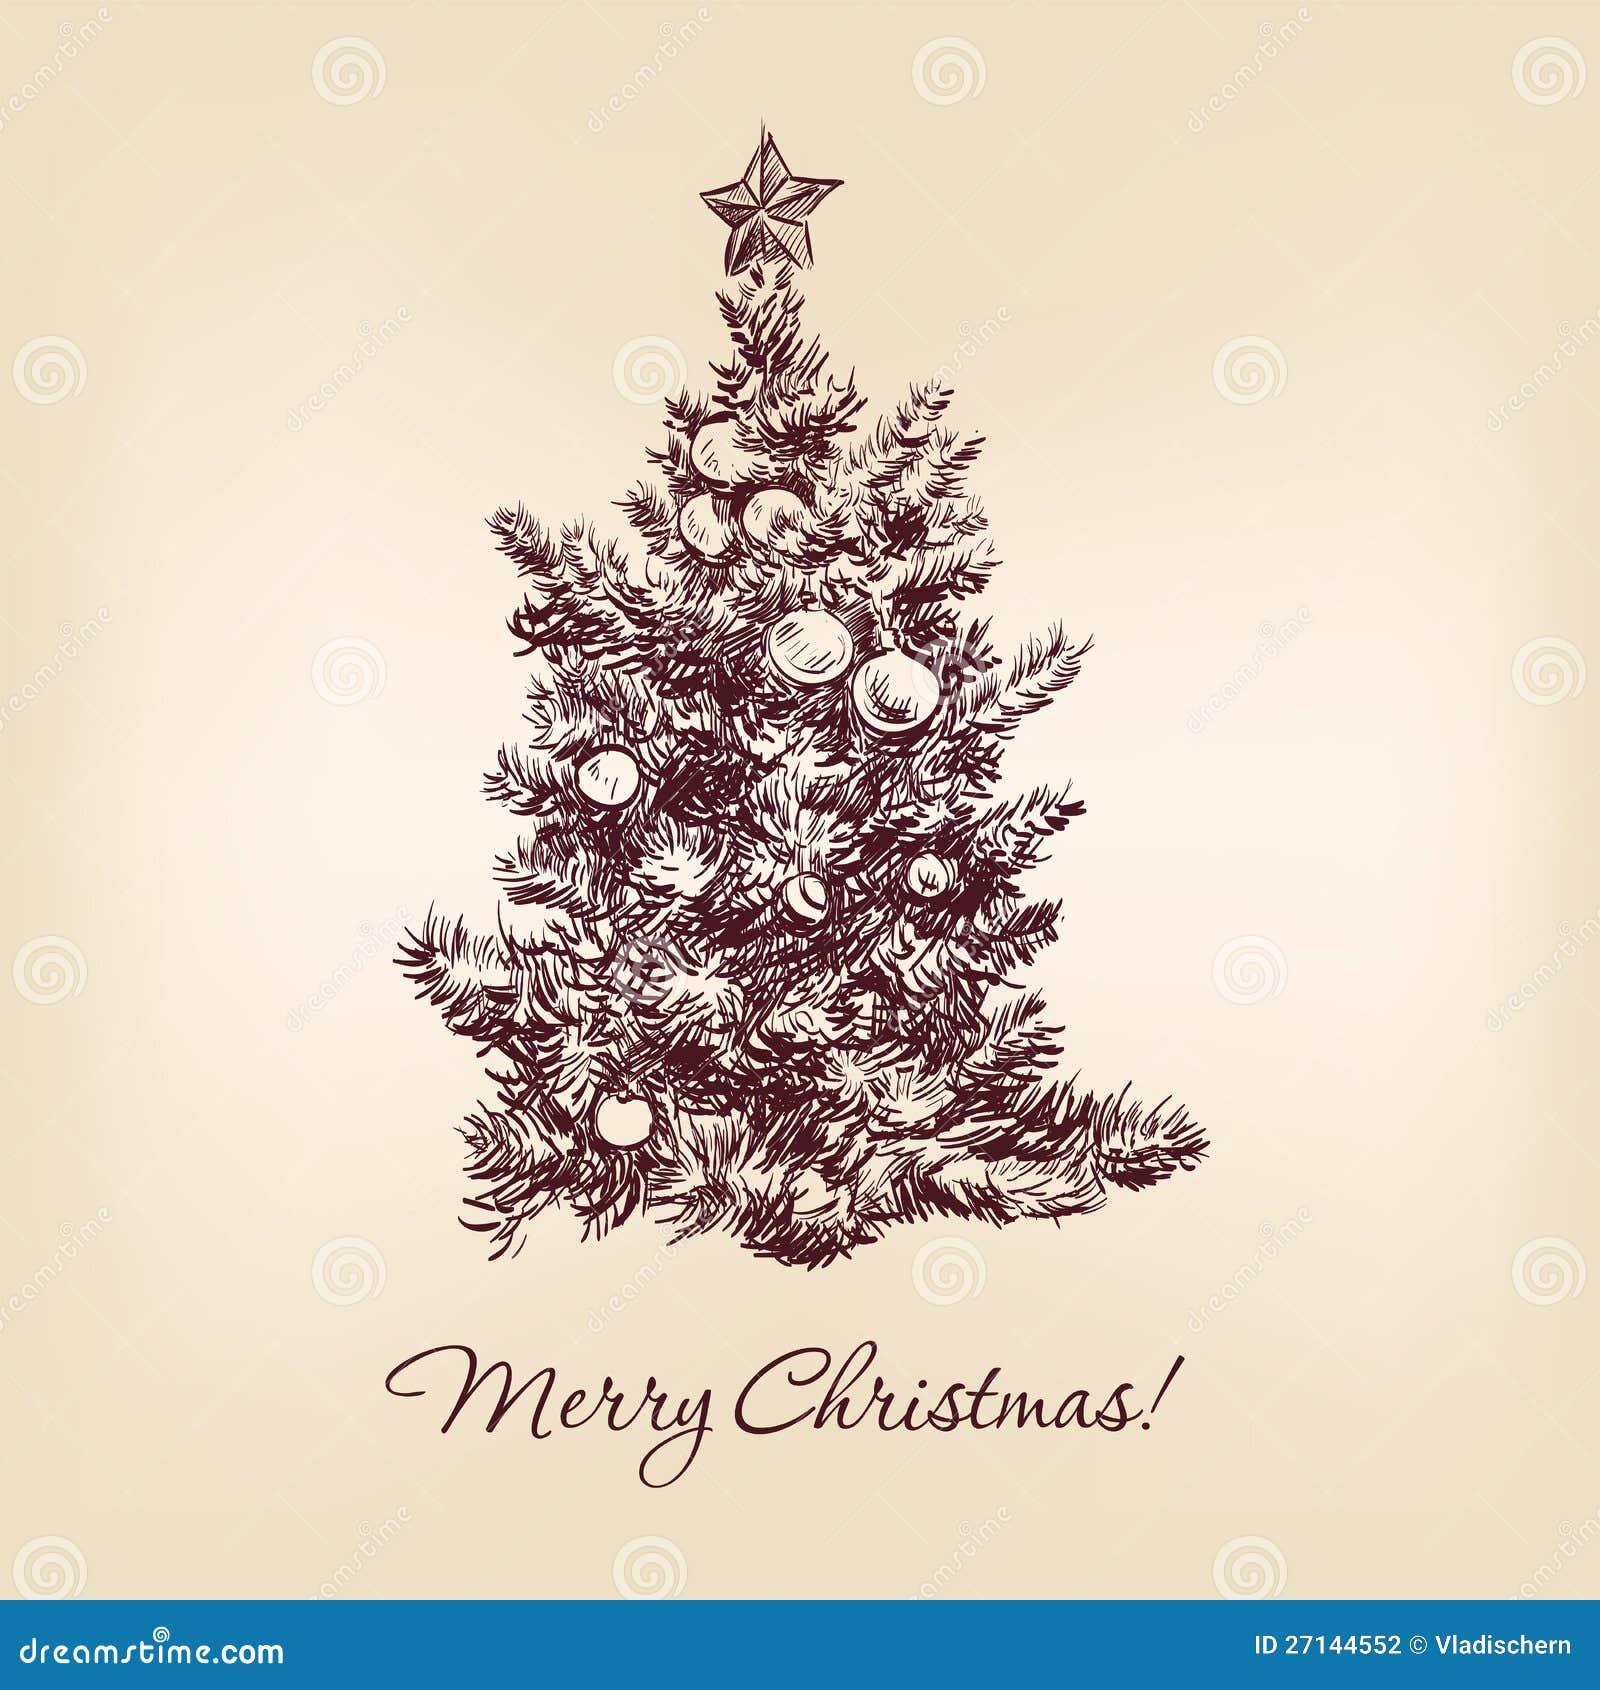 Realistic christmas tree drawing - Christmas Tree Drawing Realistic